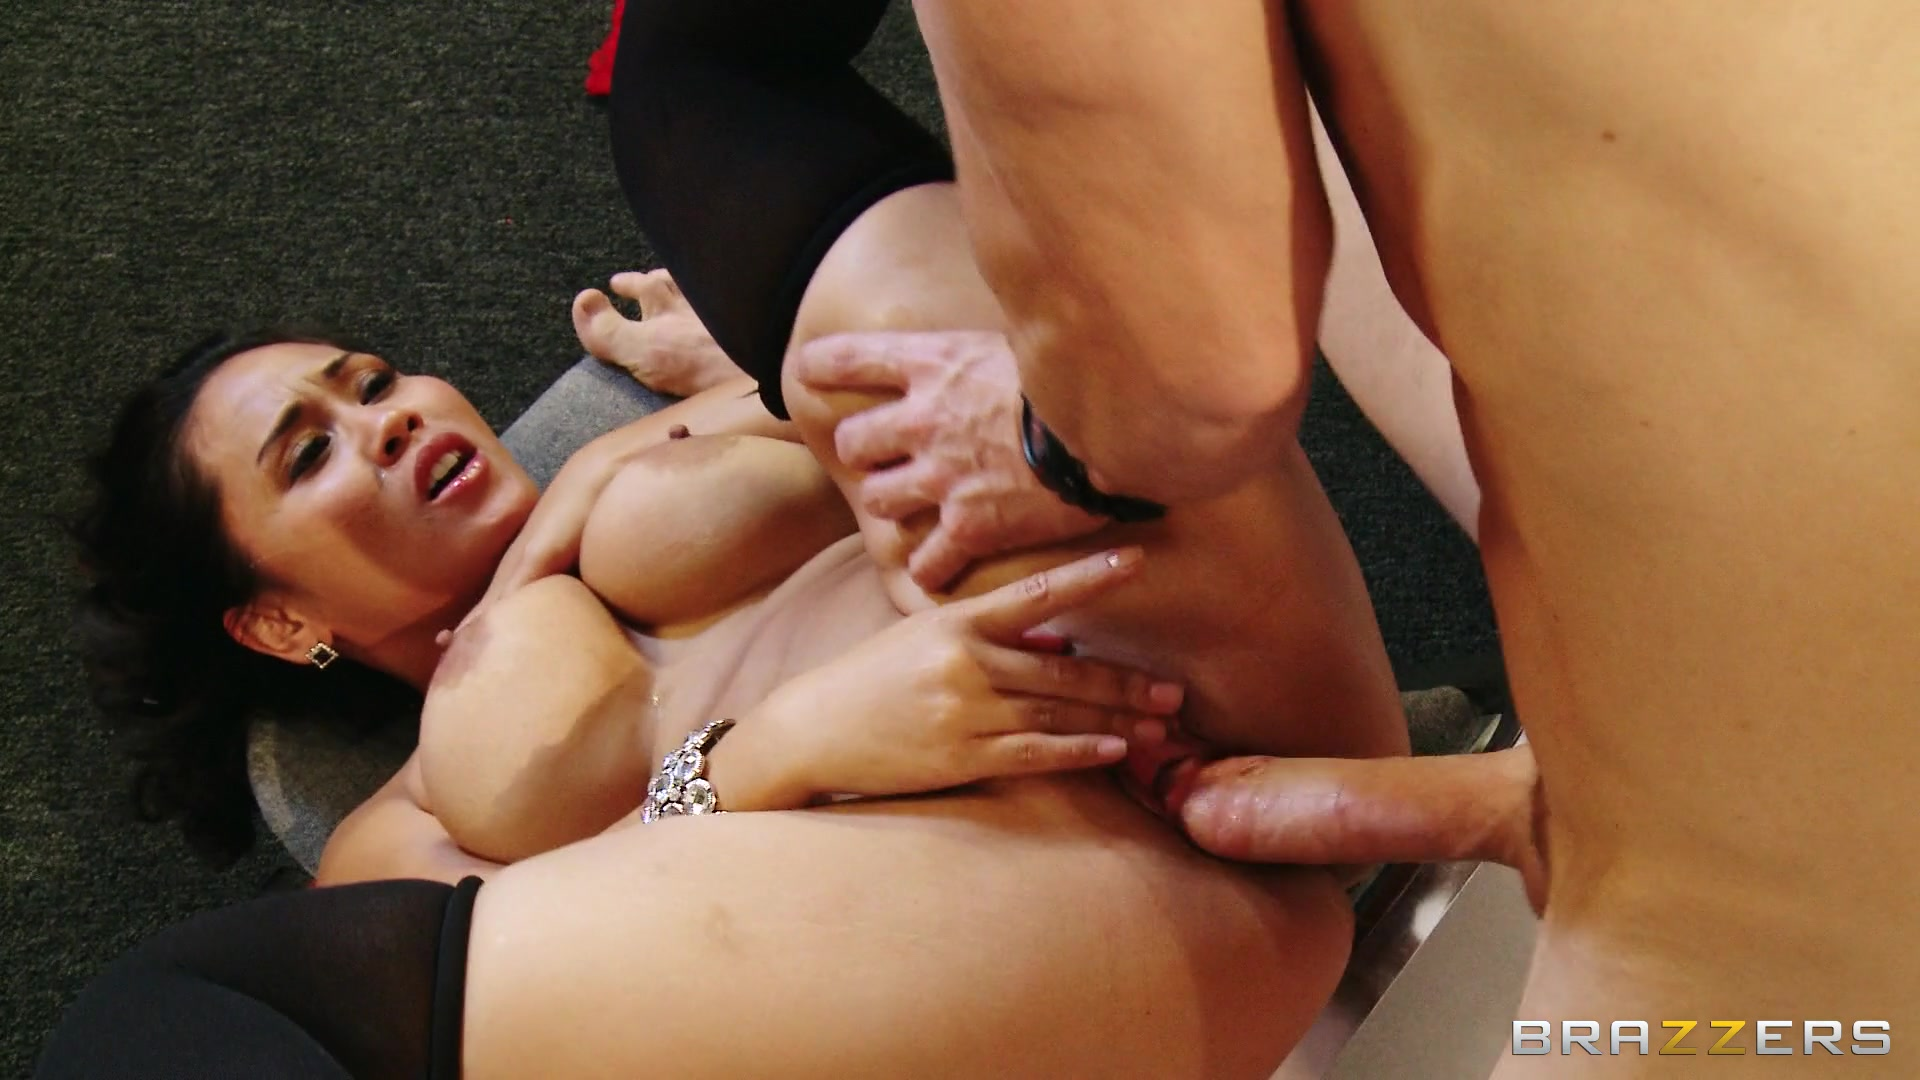 Jessica Bangkok Animal Porn adult empire | award-winning retailer of streaming porn